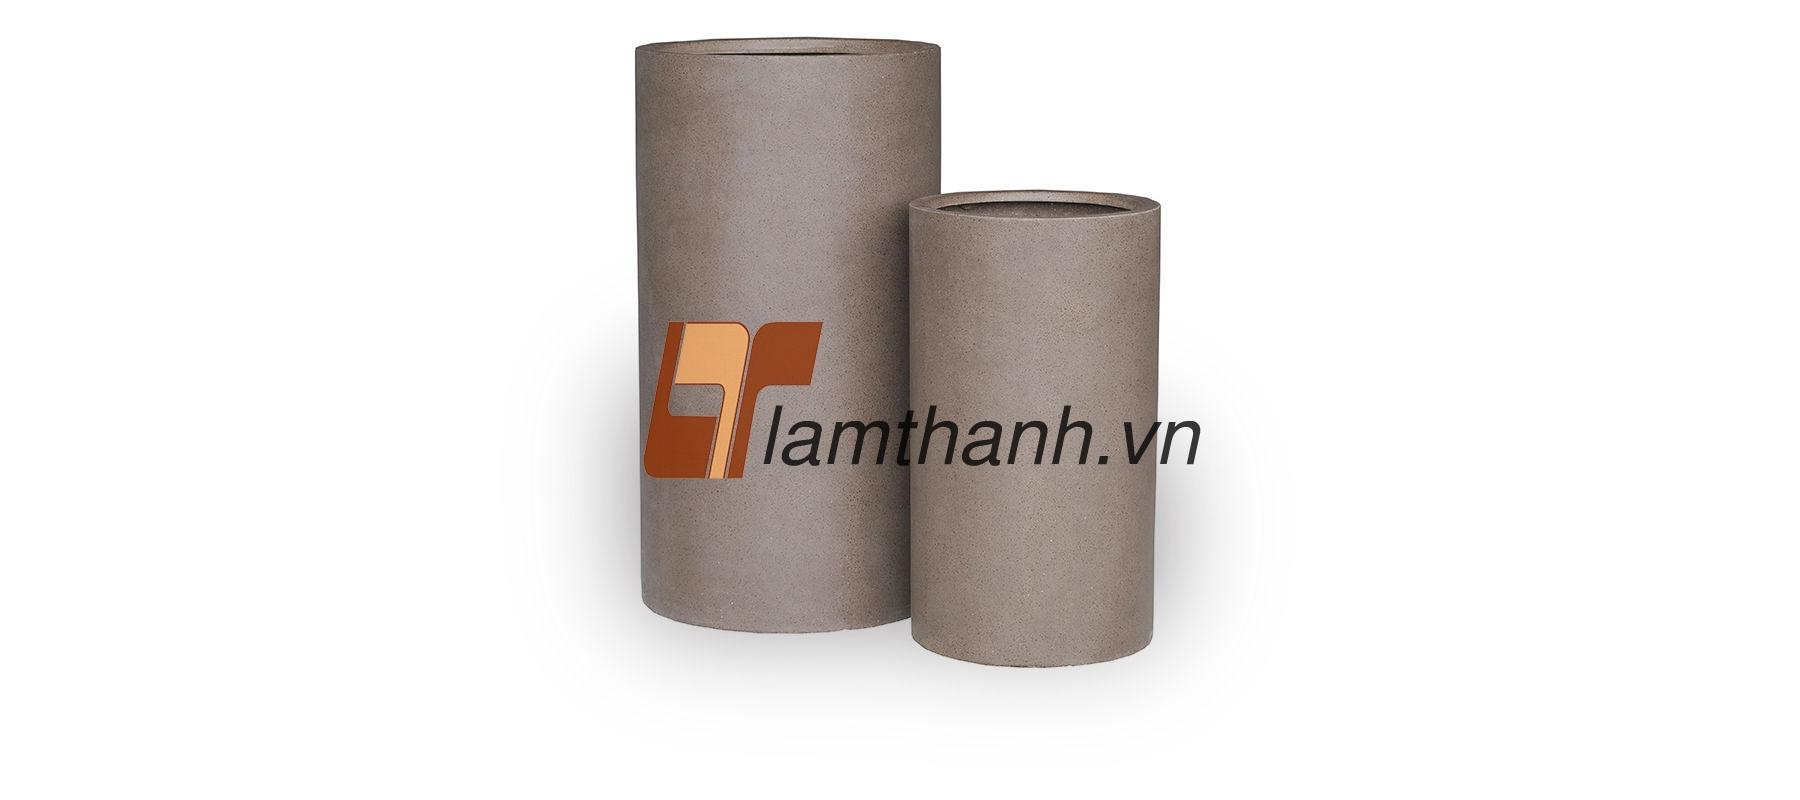 vietnam polystone, fiberstone 07